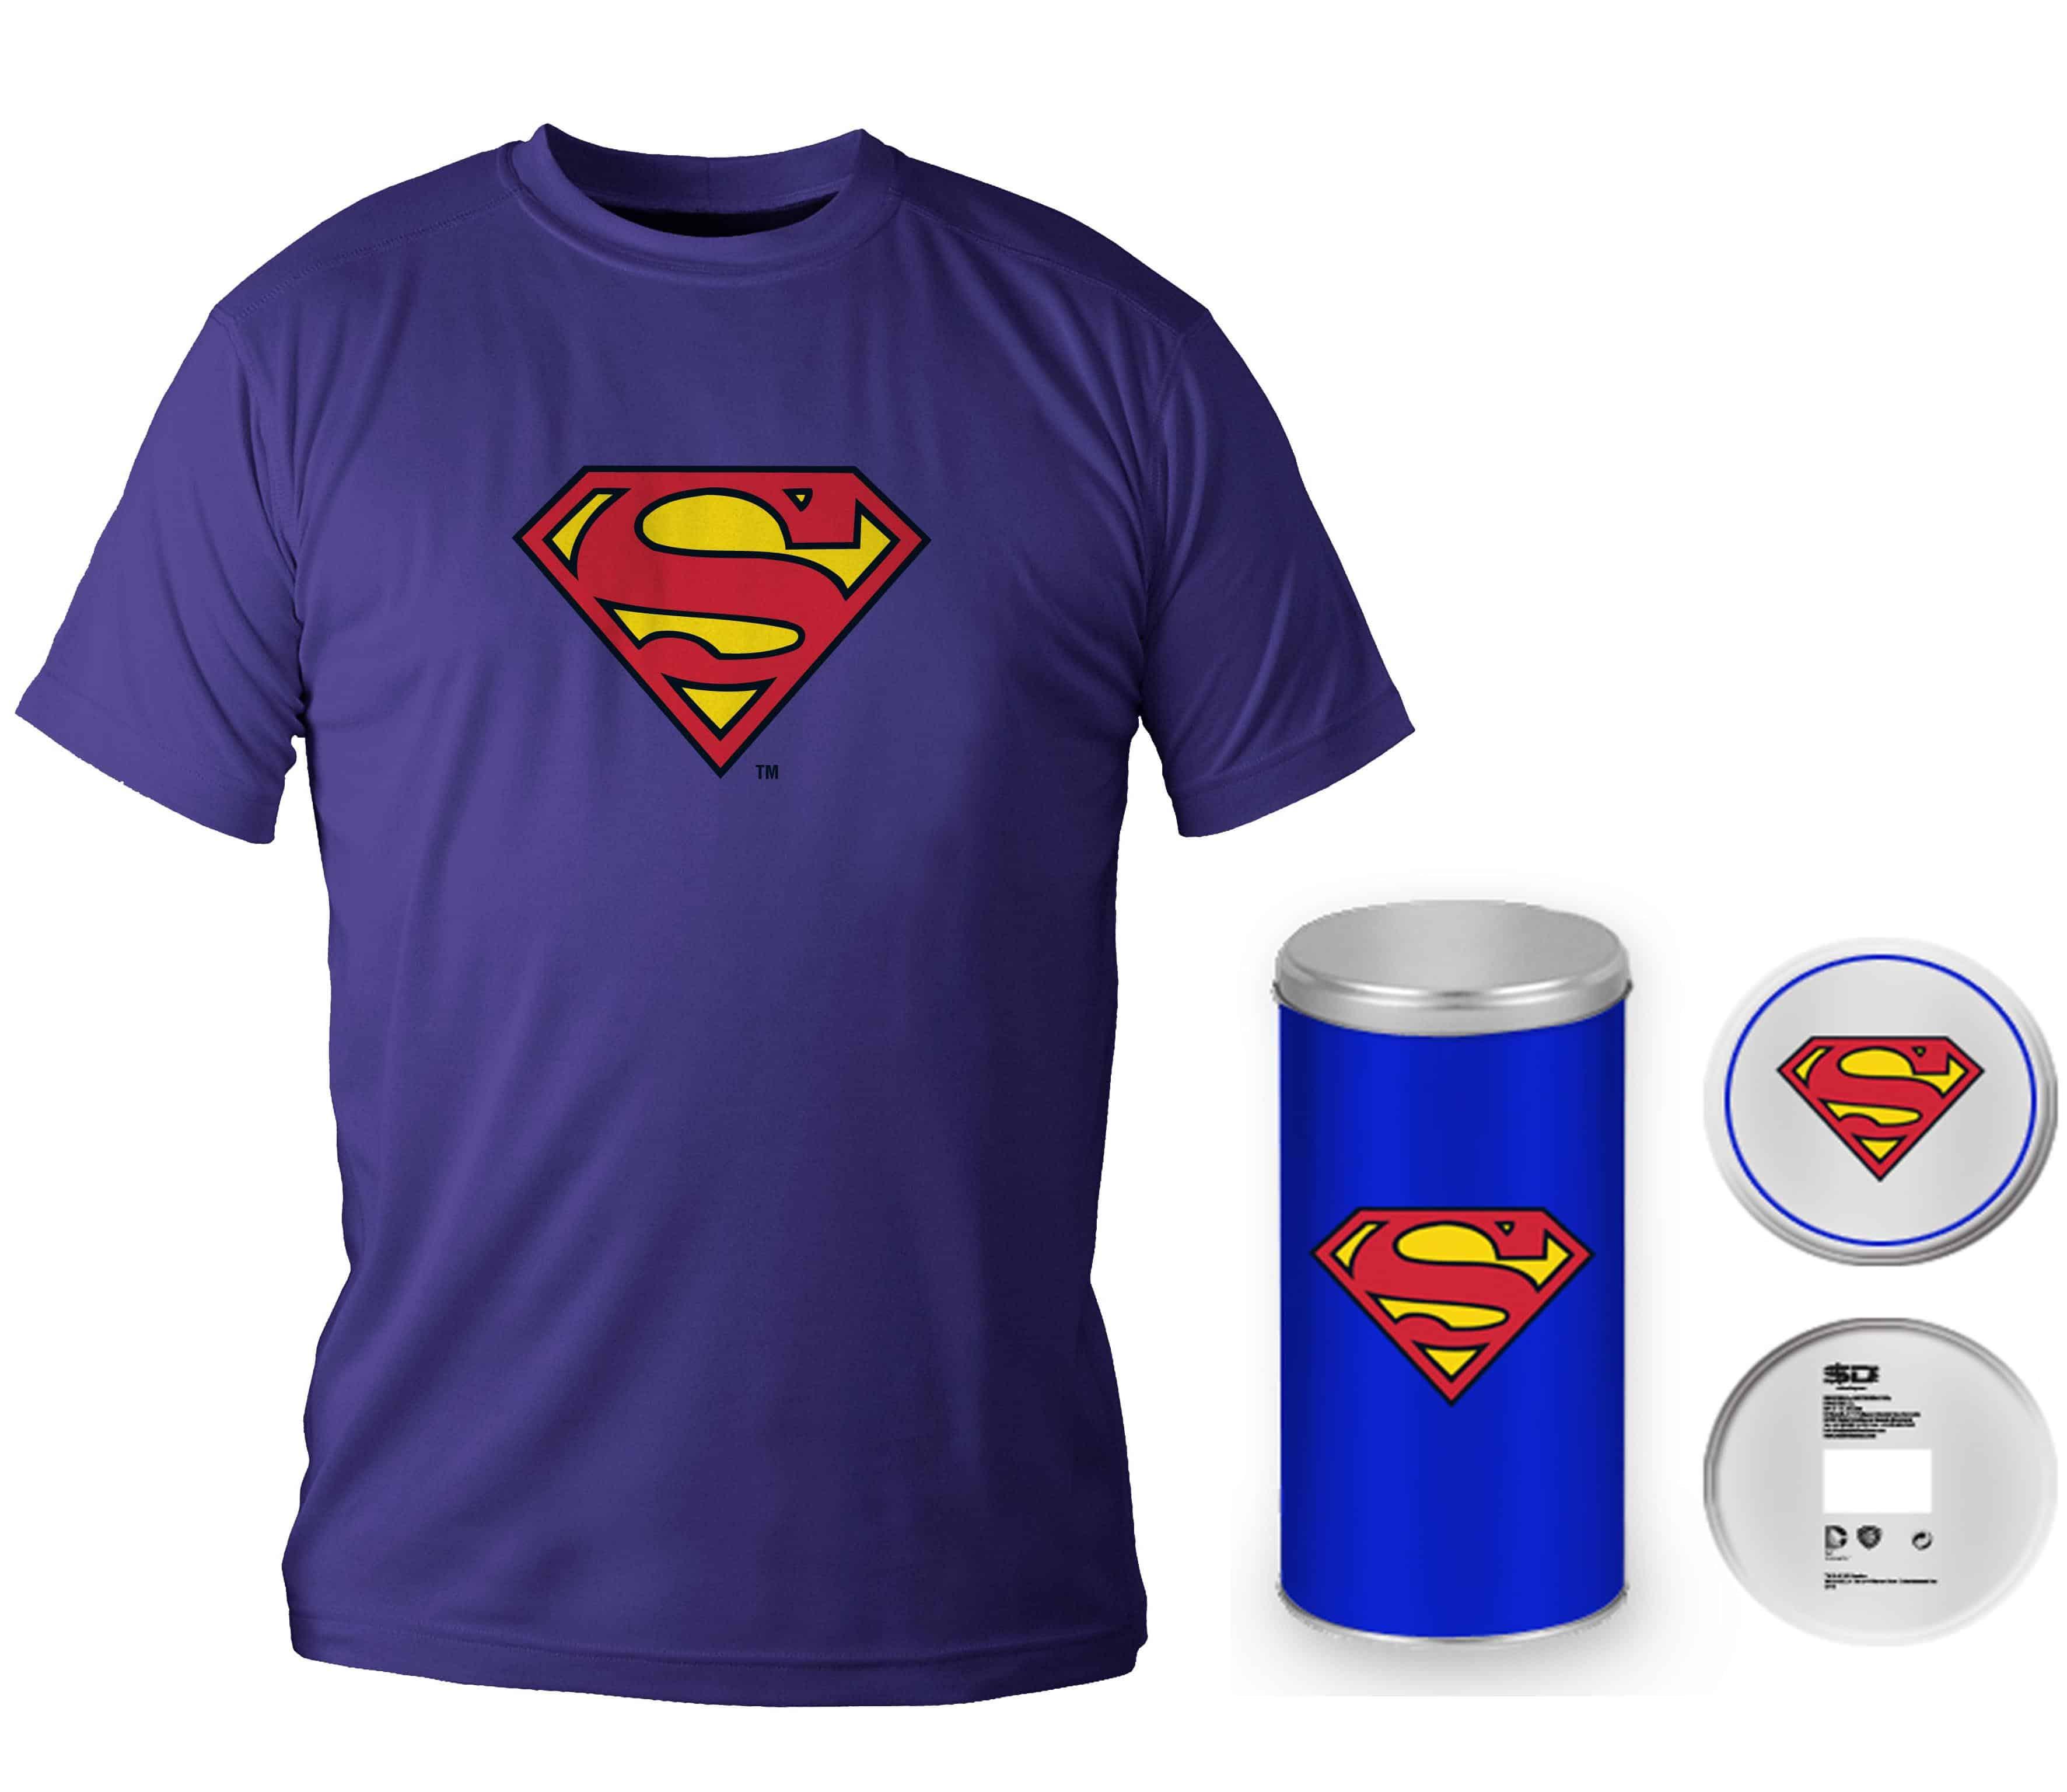 LOGO SUPERMAN CAMISETA AZUL CHICO T-L EDICION DELUXE DC COMICS